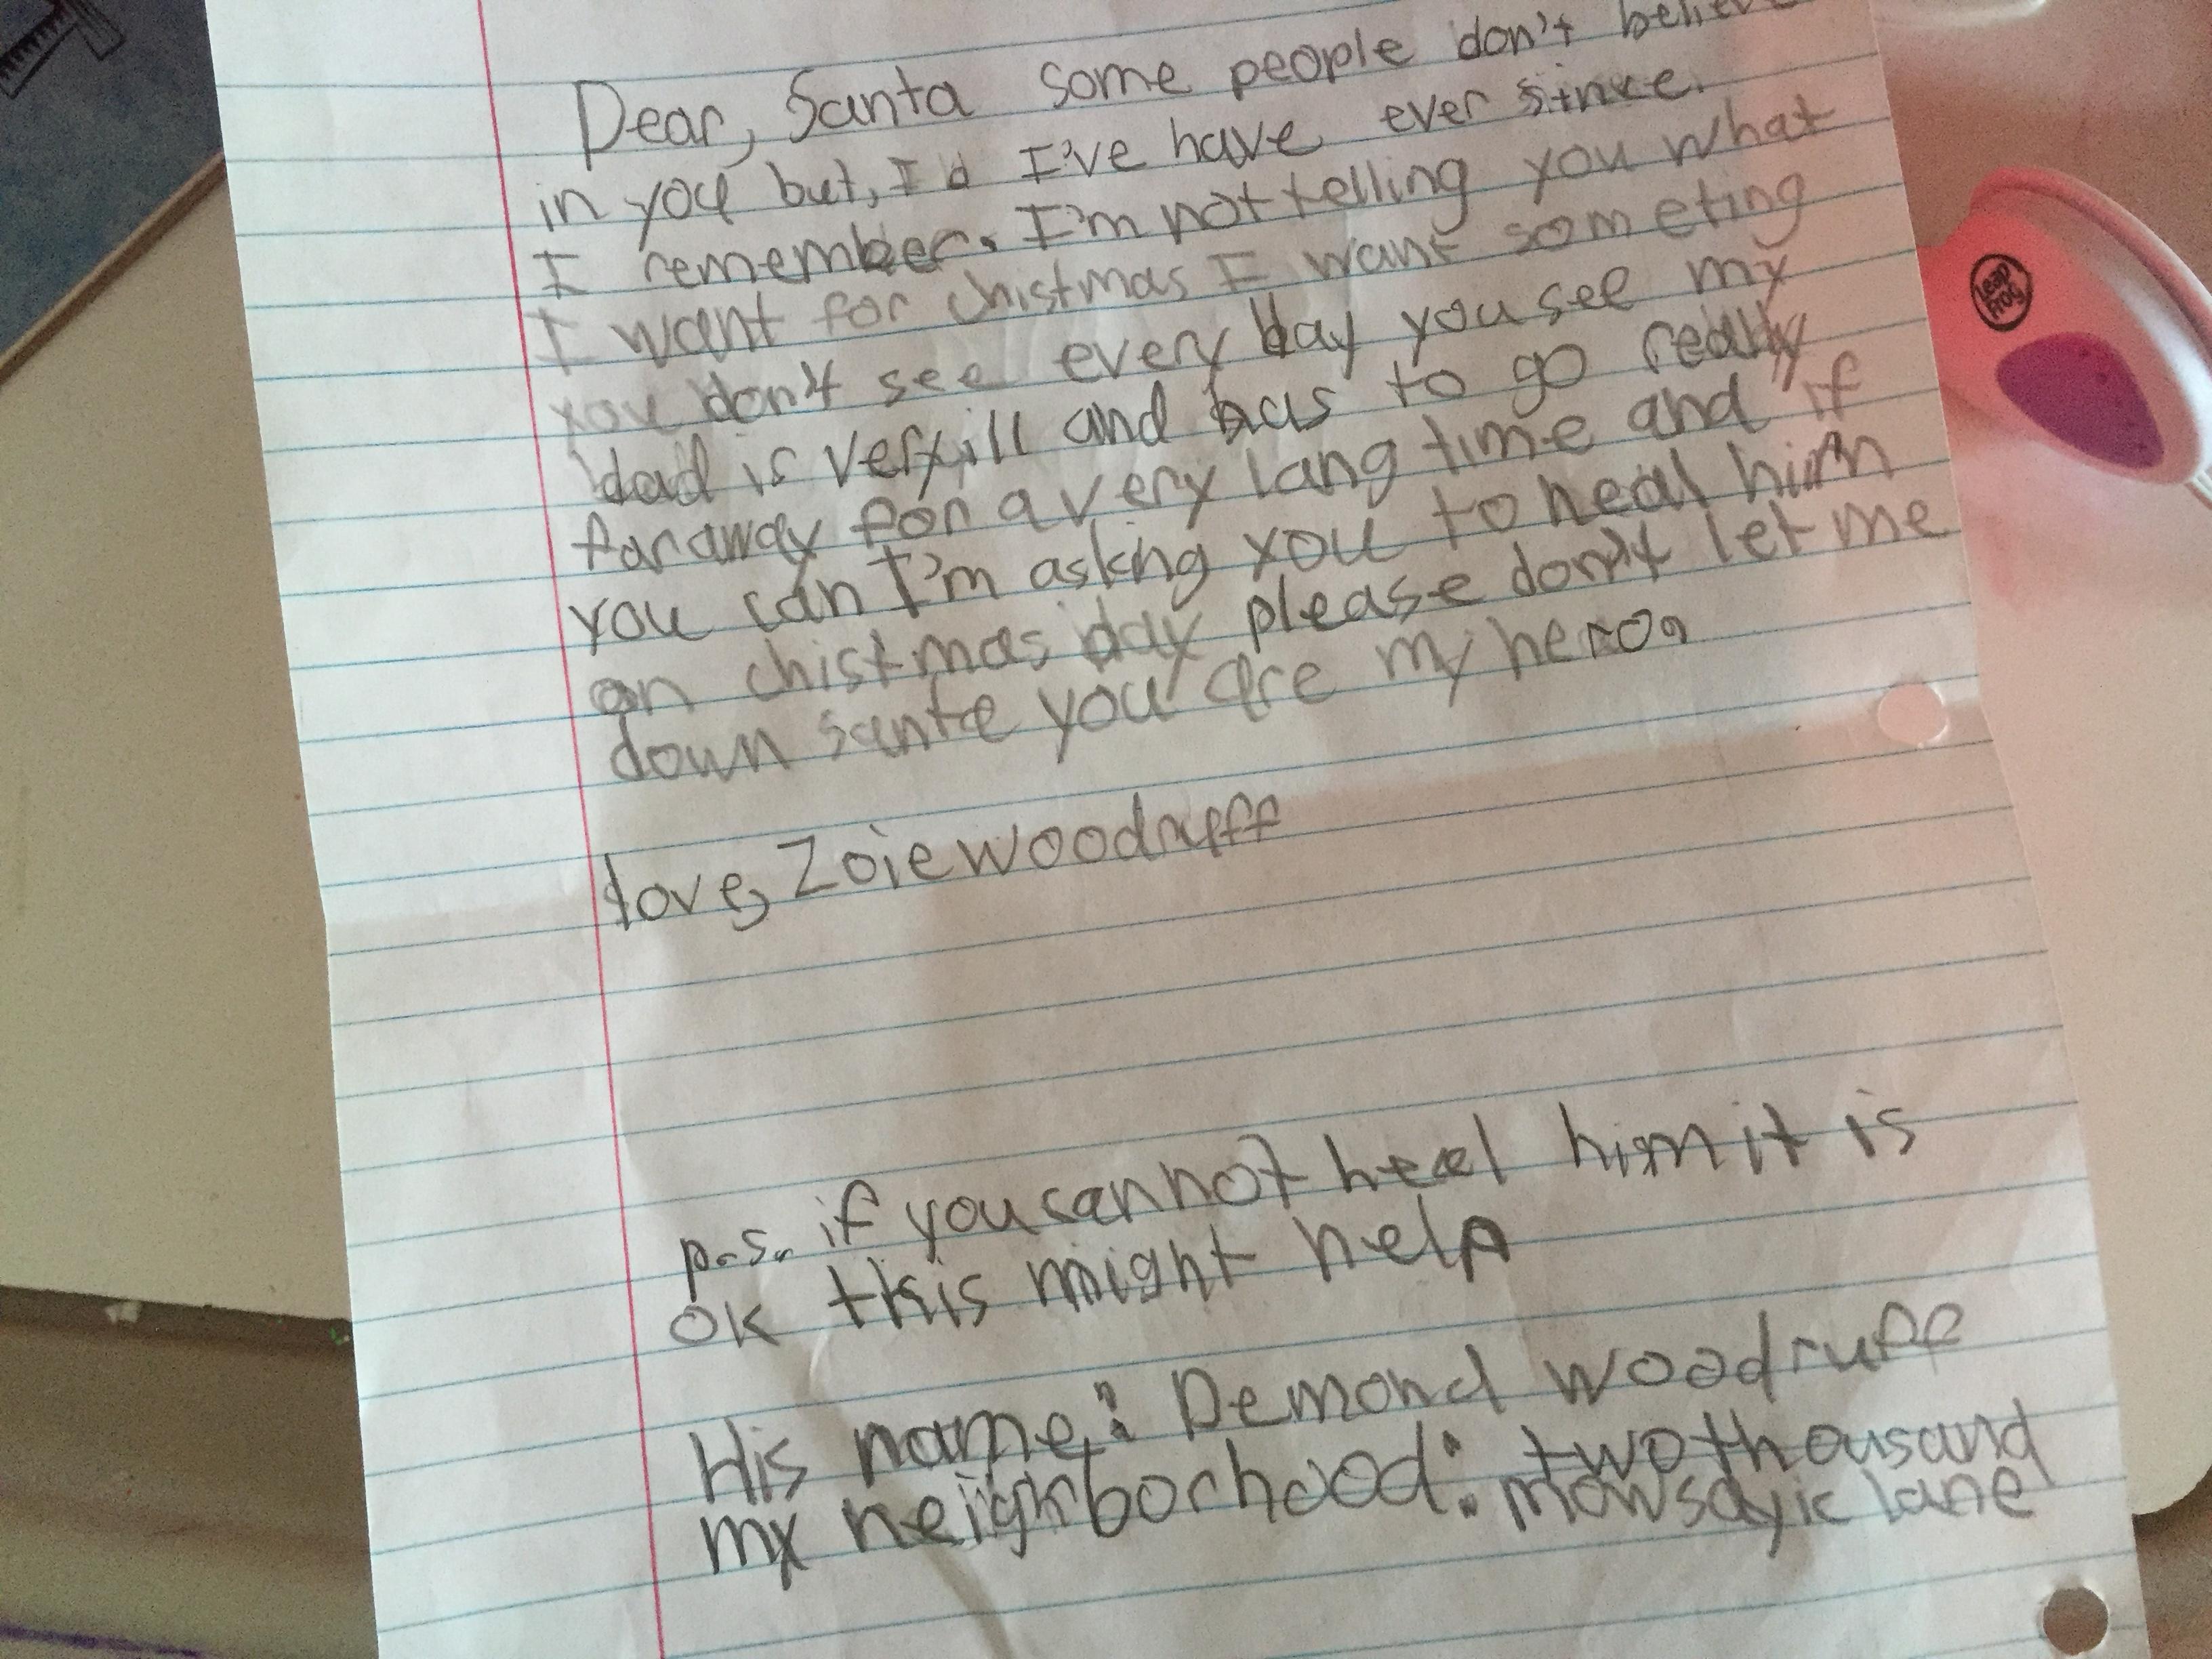 Dear, Santa Letter